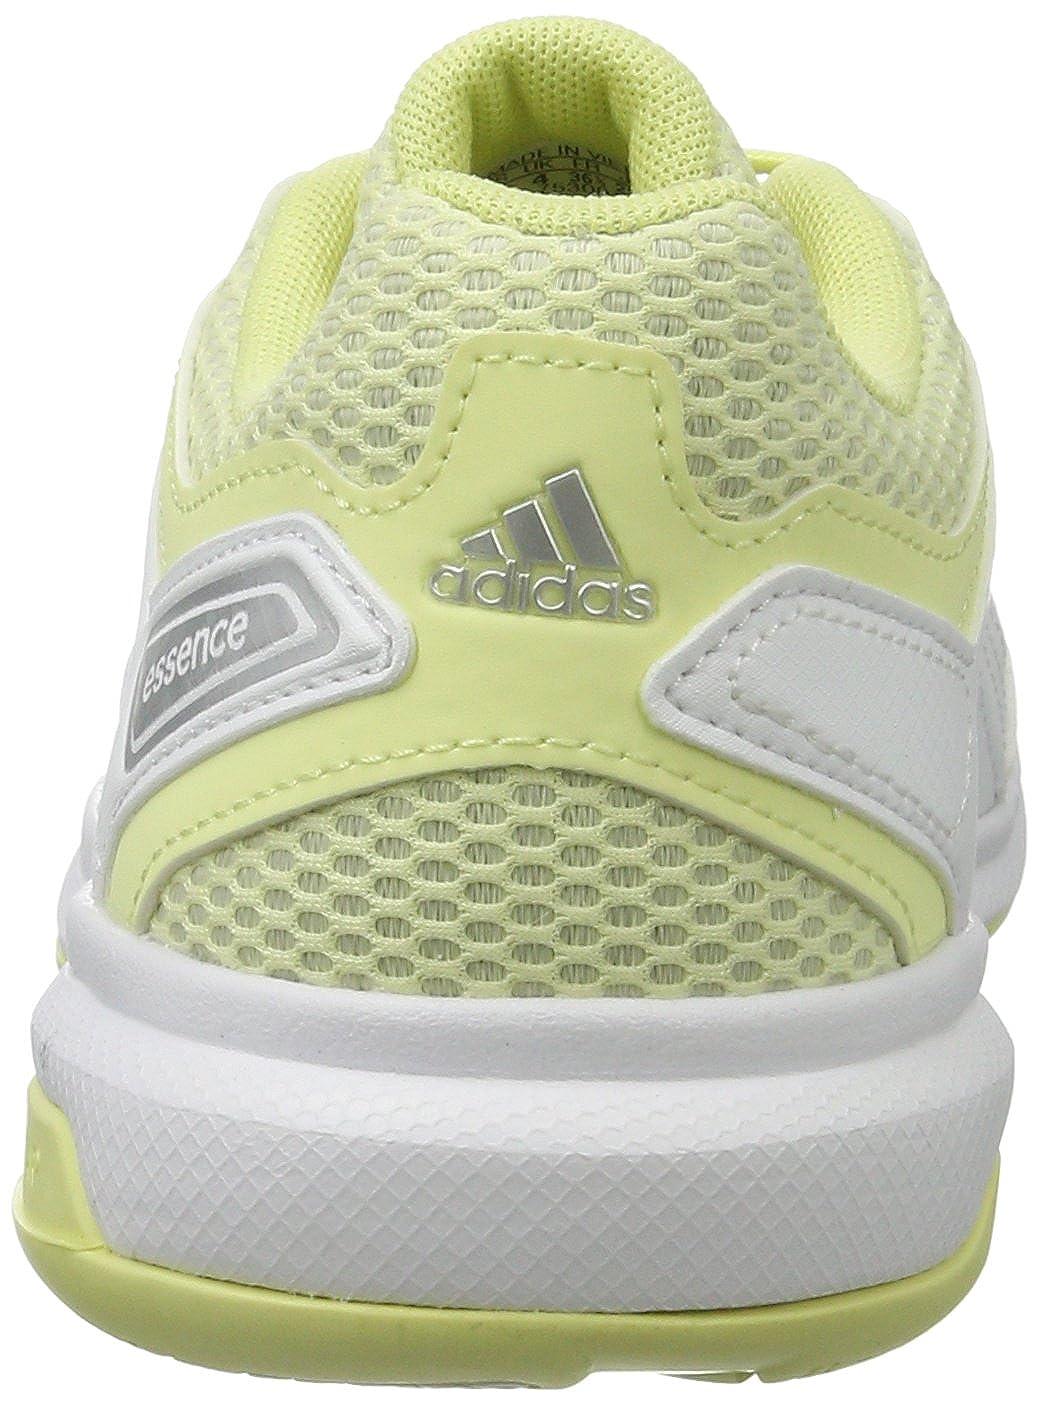 buy popular f6dc8 aa960 Adidas Essence W, Scarpe da Pallamano Bambina Amazon.it Scar